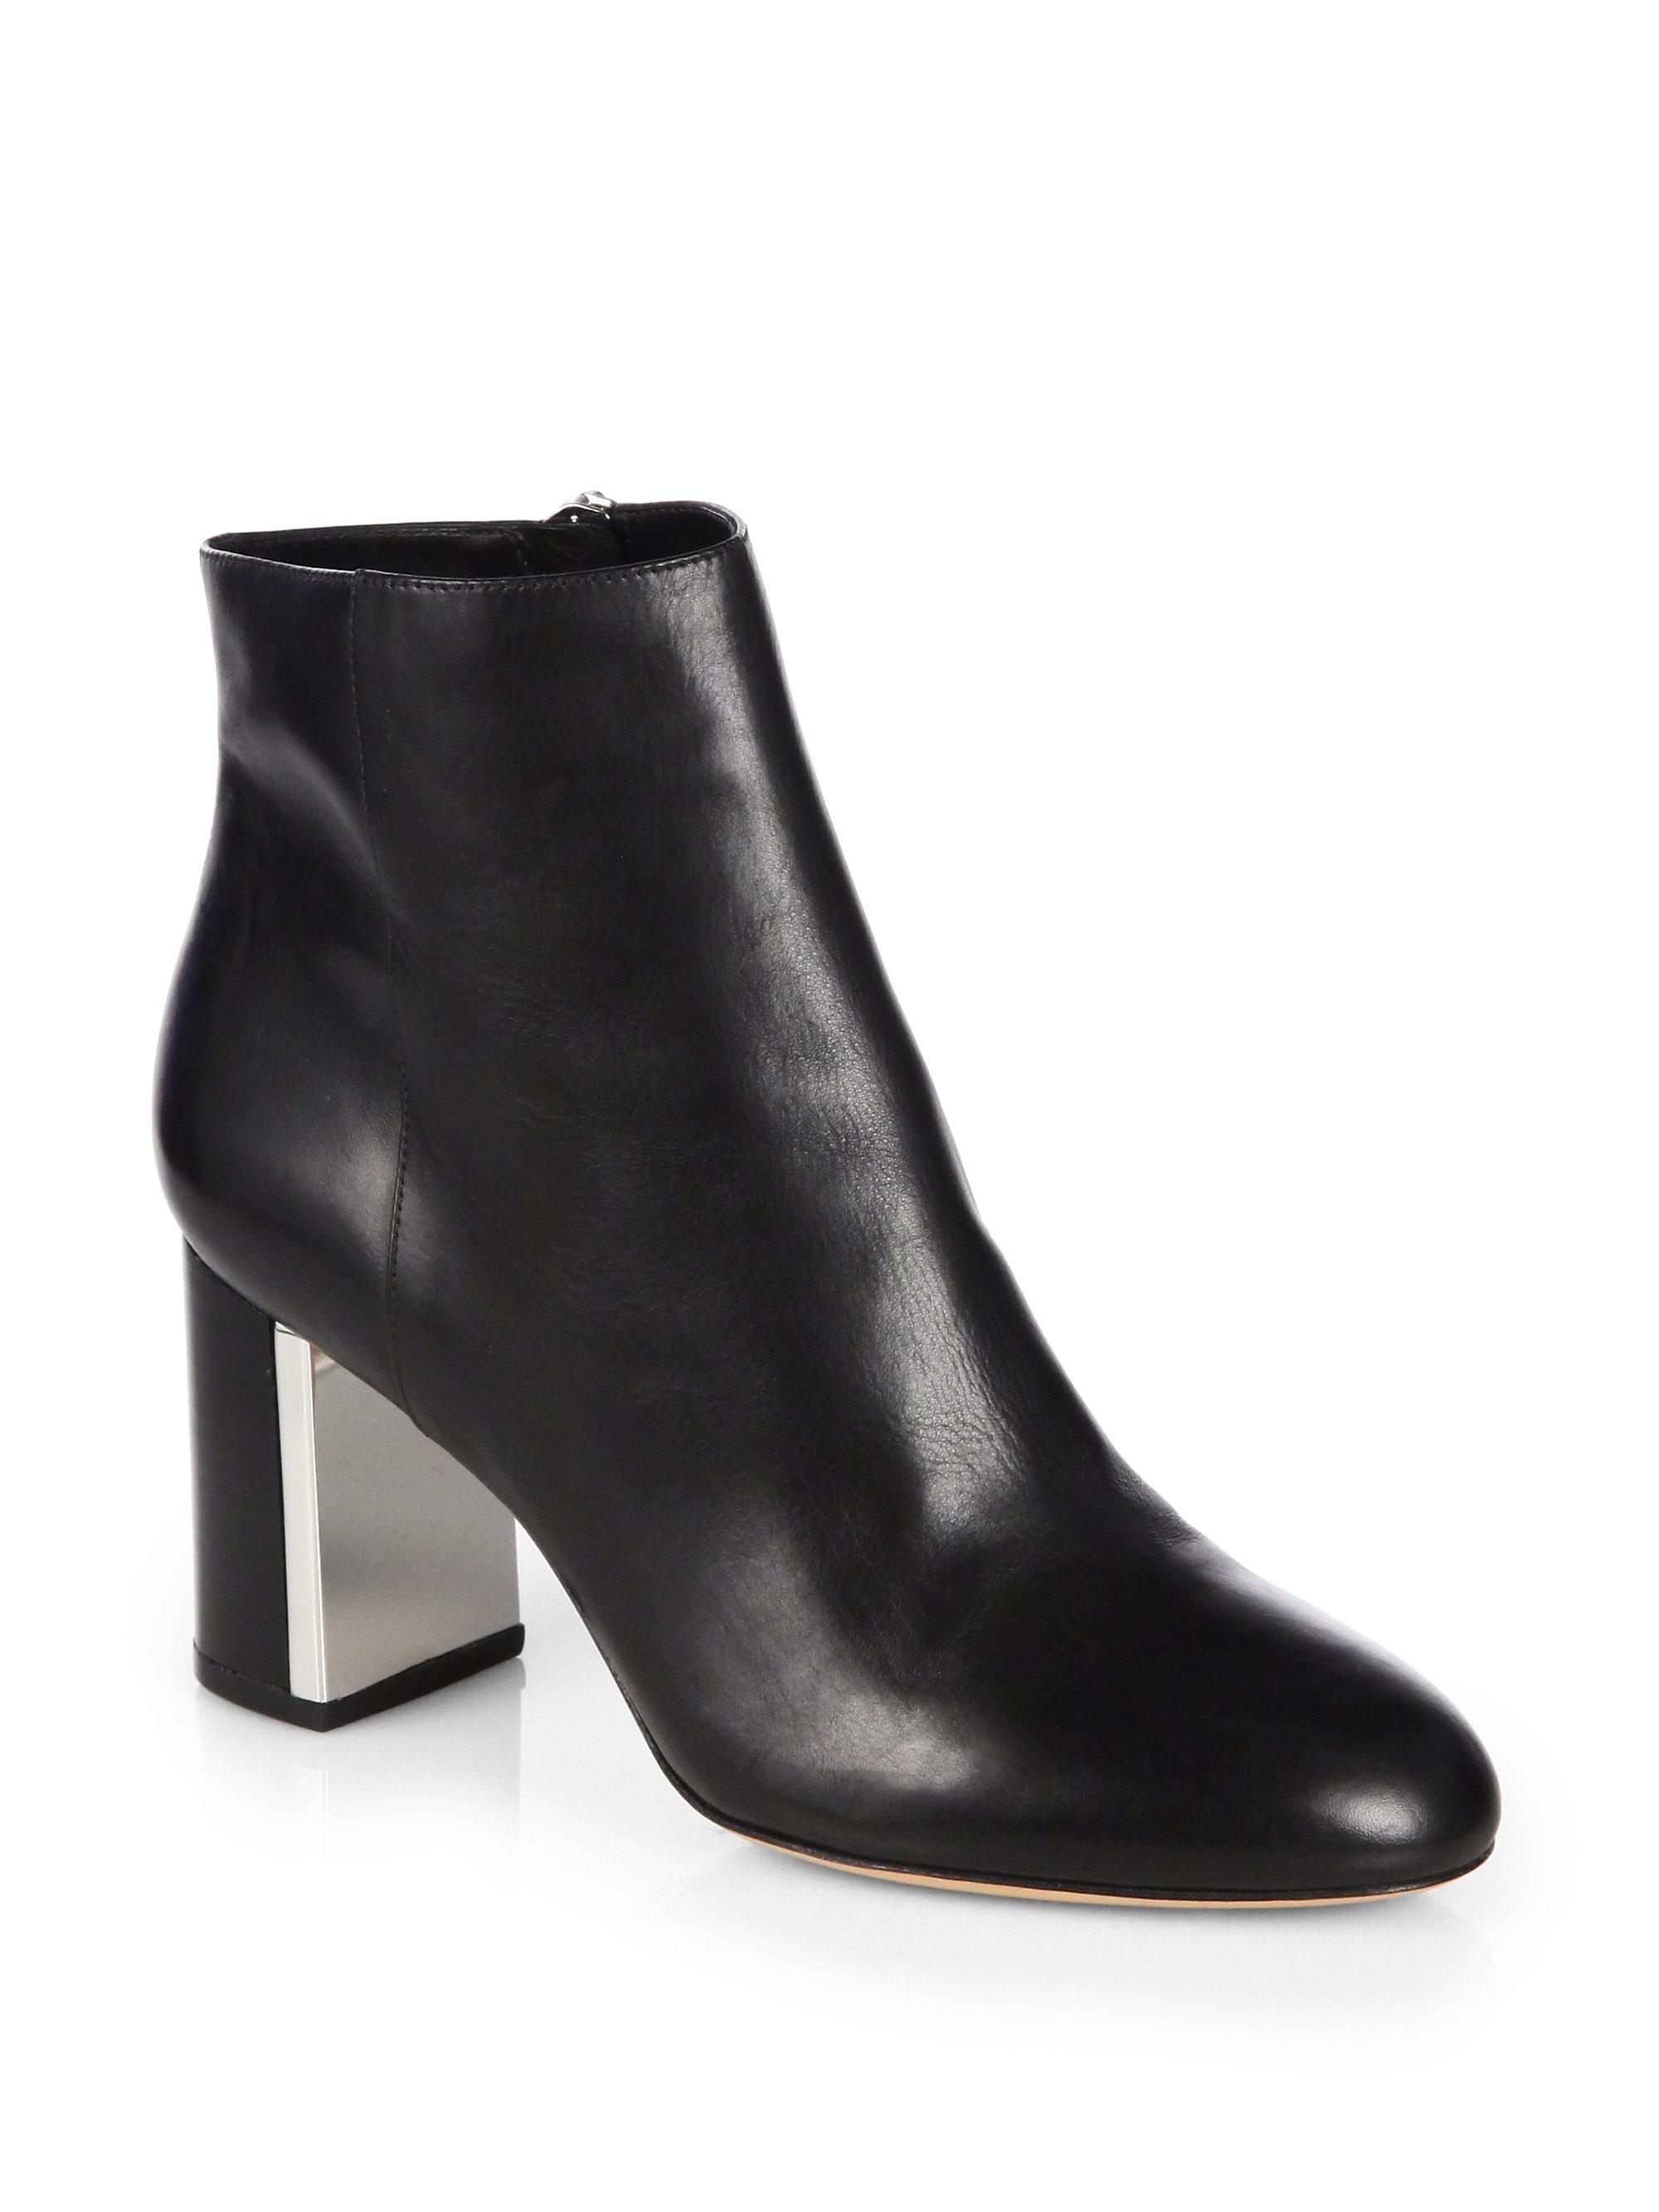 michael kors vivi leather ankle boots in black lyst. Black Bedroom Furniture Sets. Home Design Ideas